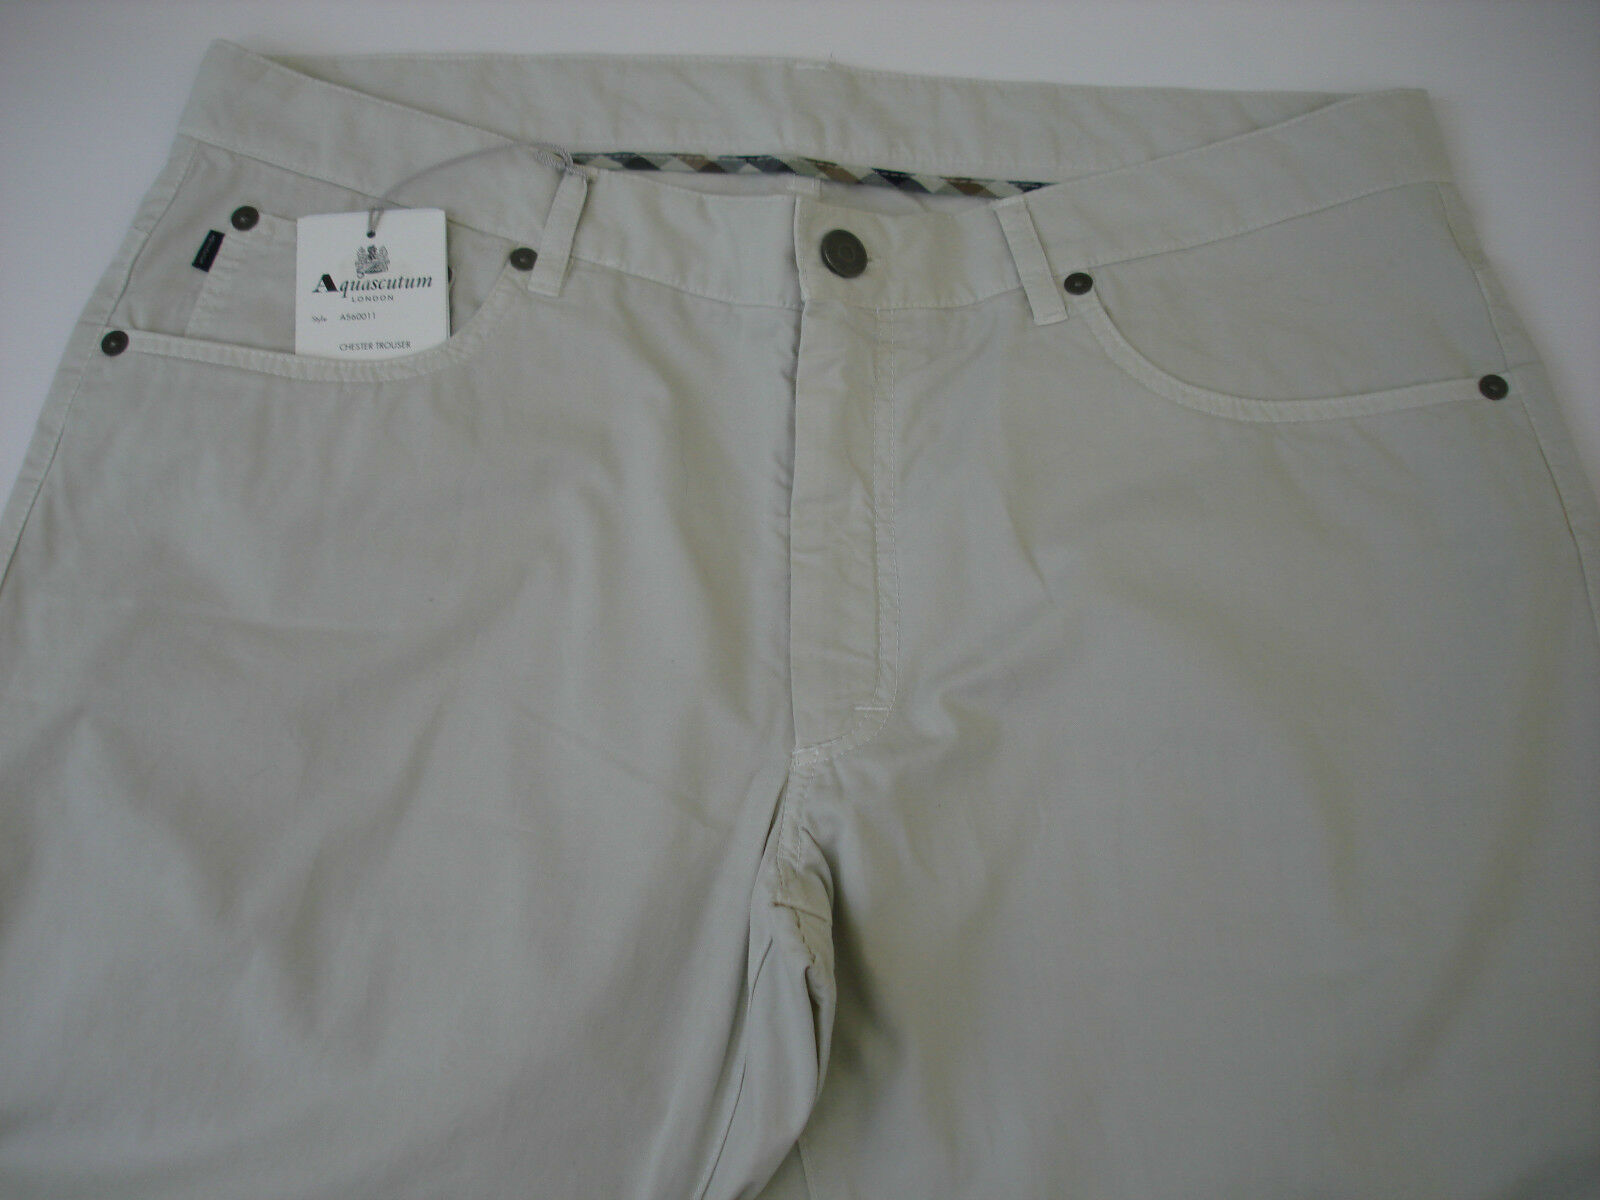 AQUASCUTUM Beige CHESTER Jean Style Trousers sz 36 BNWT Slimfit ITALIAN Made